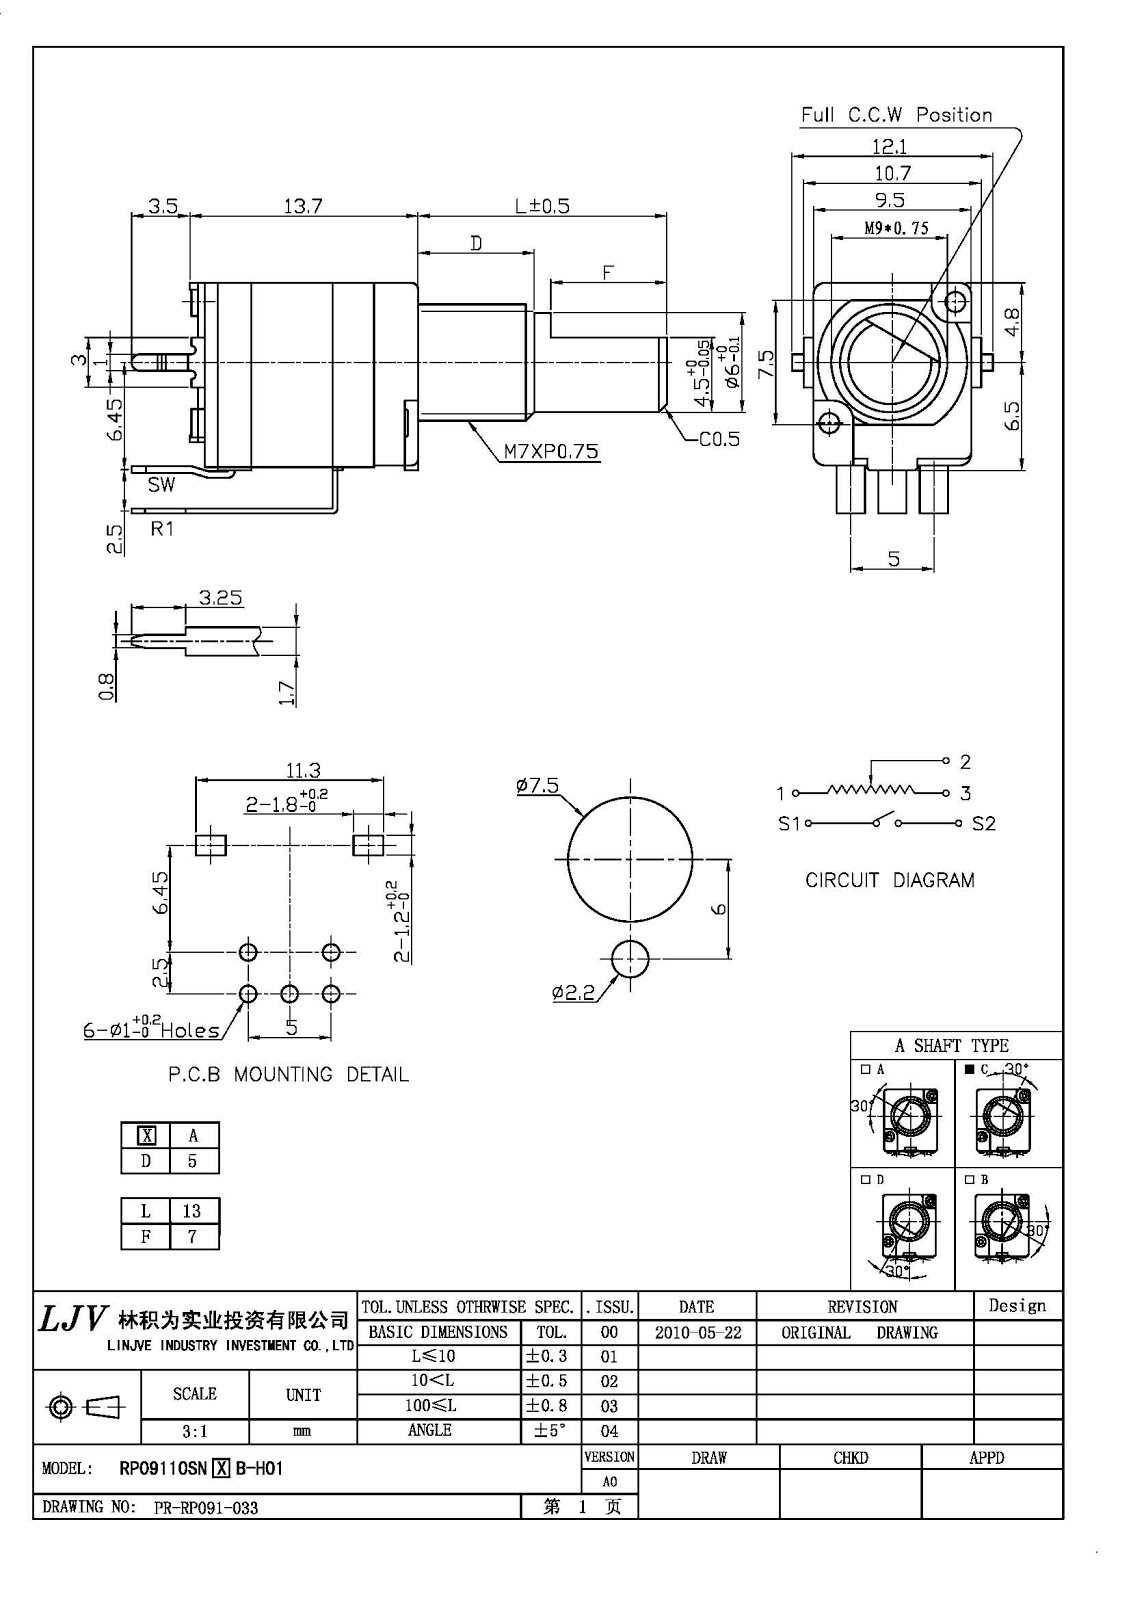 Ljv Encoders Potentiometers Amp Switch Dongguan Ljv B50k